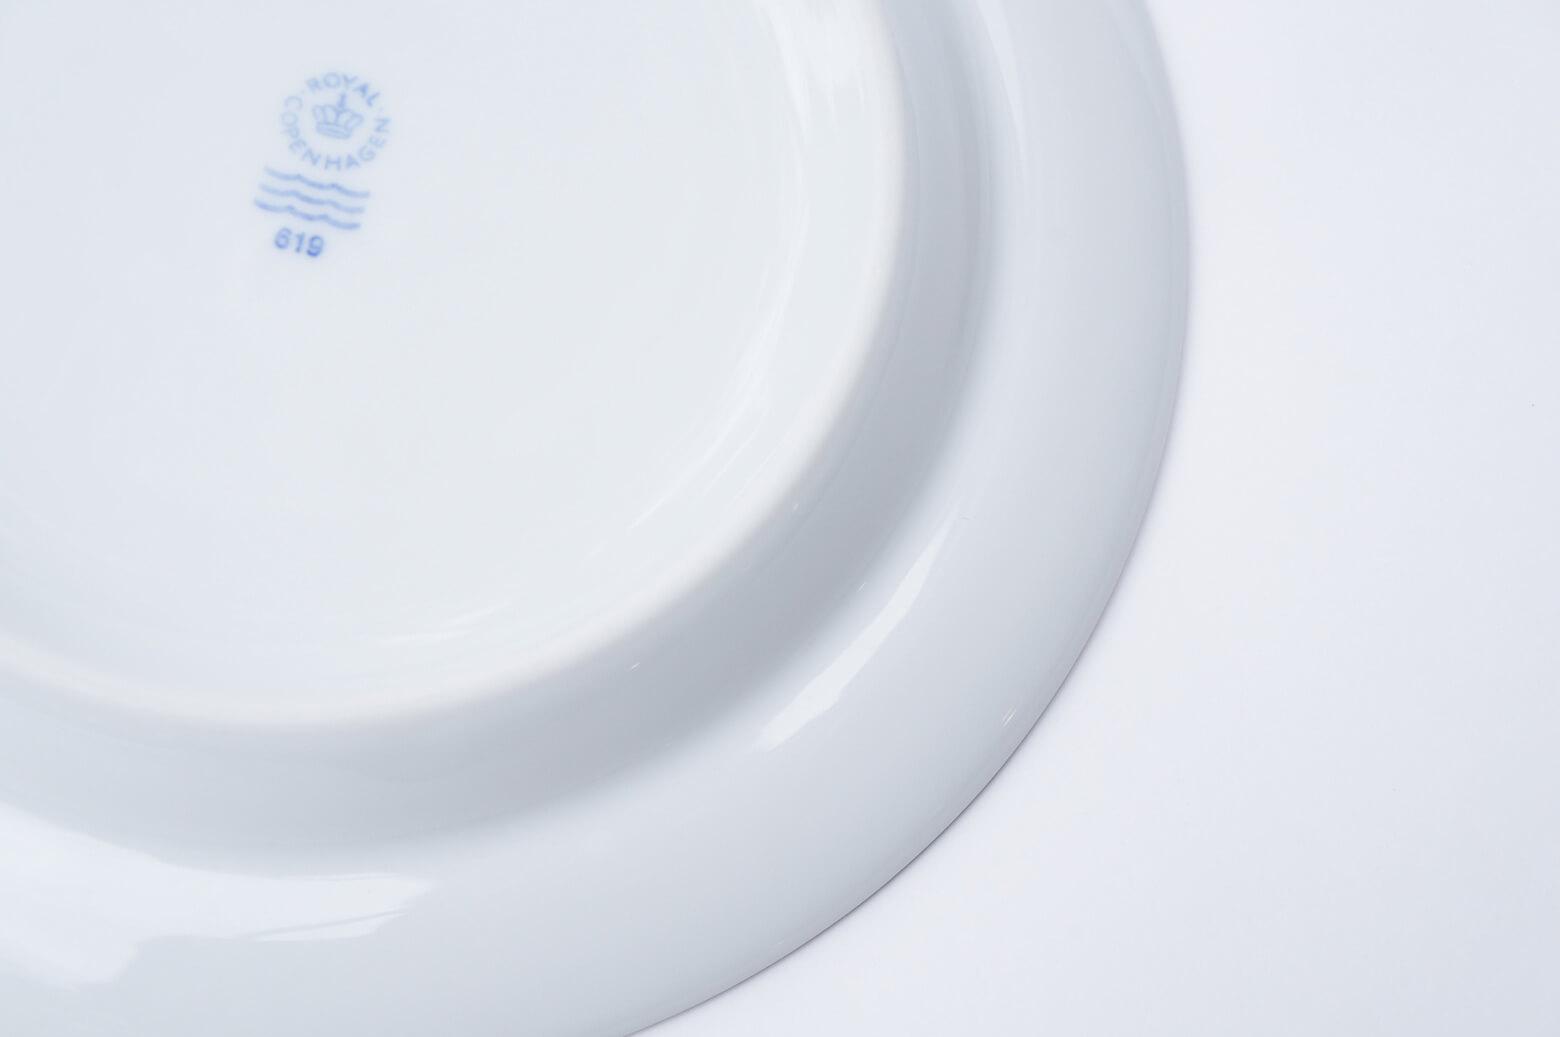 Copenhagen WHITE POT Series/ロイヤル コペンハーゲン ホワイト ポット シリーズ プレート 北欧 食器 5